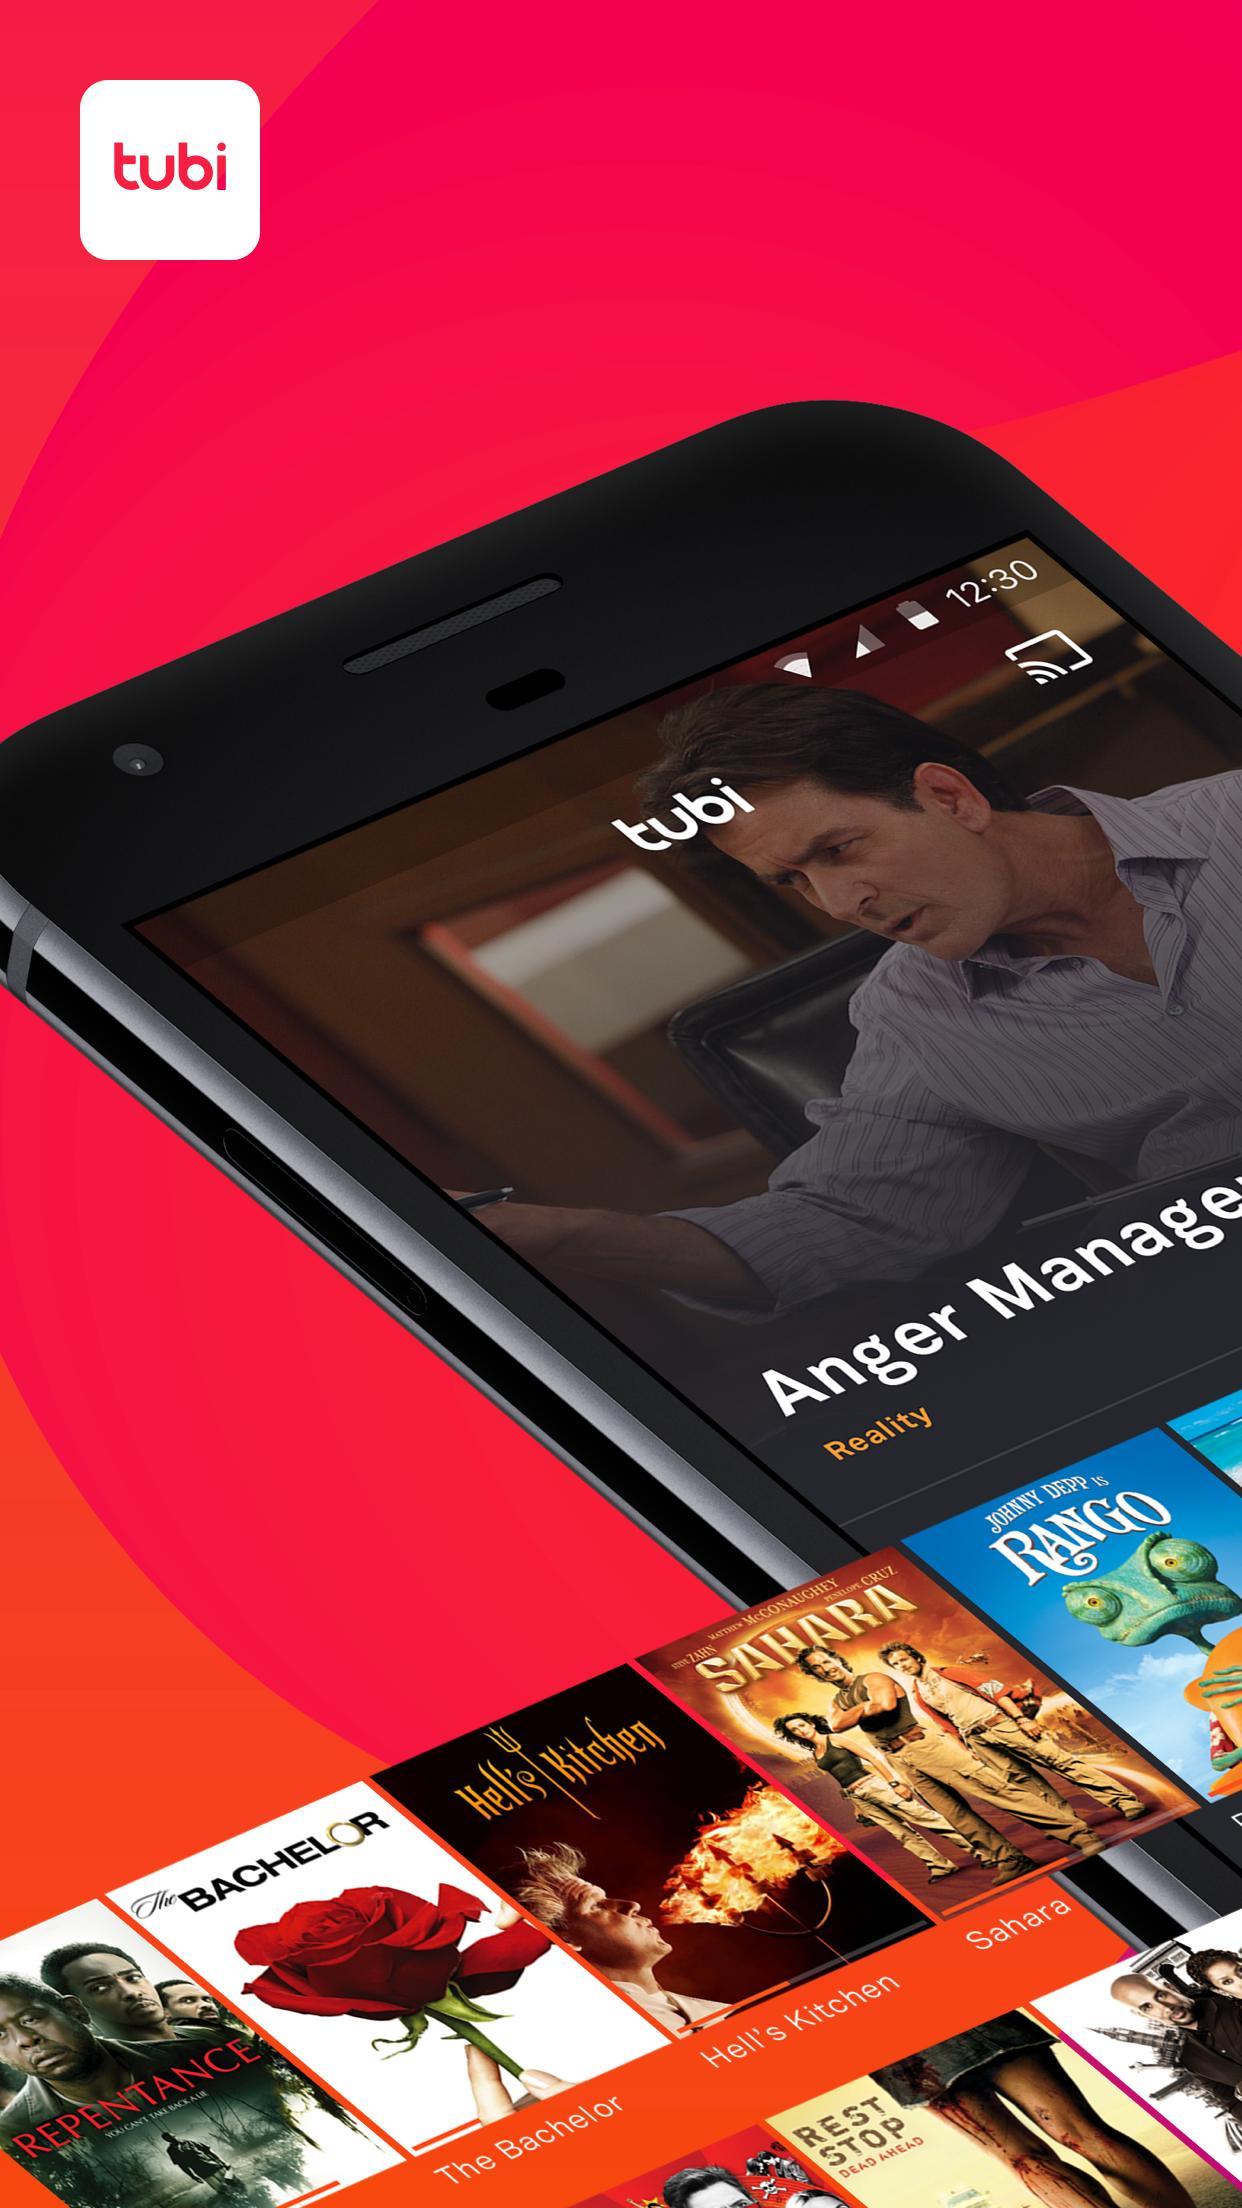 Tubi - Free Movies & TV Shows 4.7.4 Screenshot 11